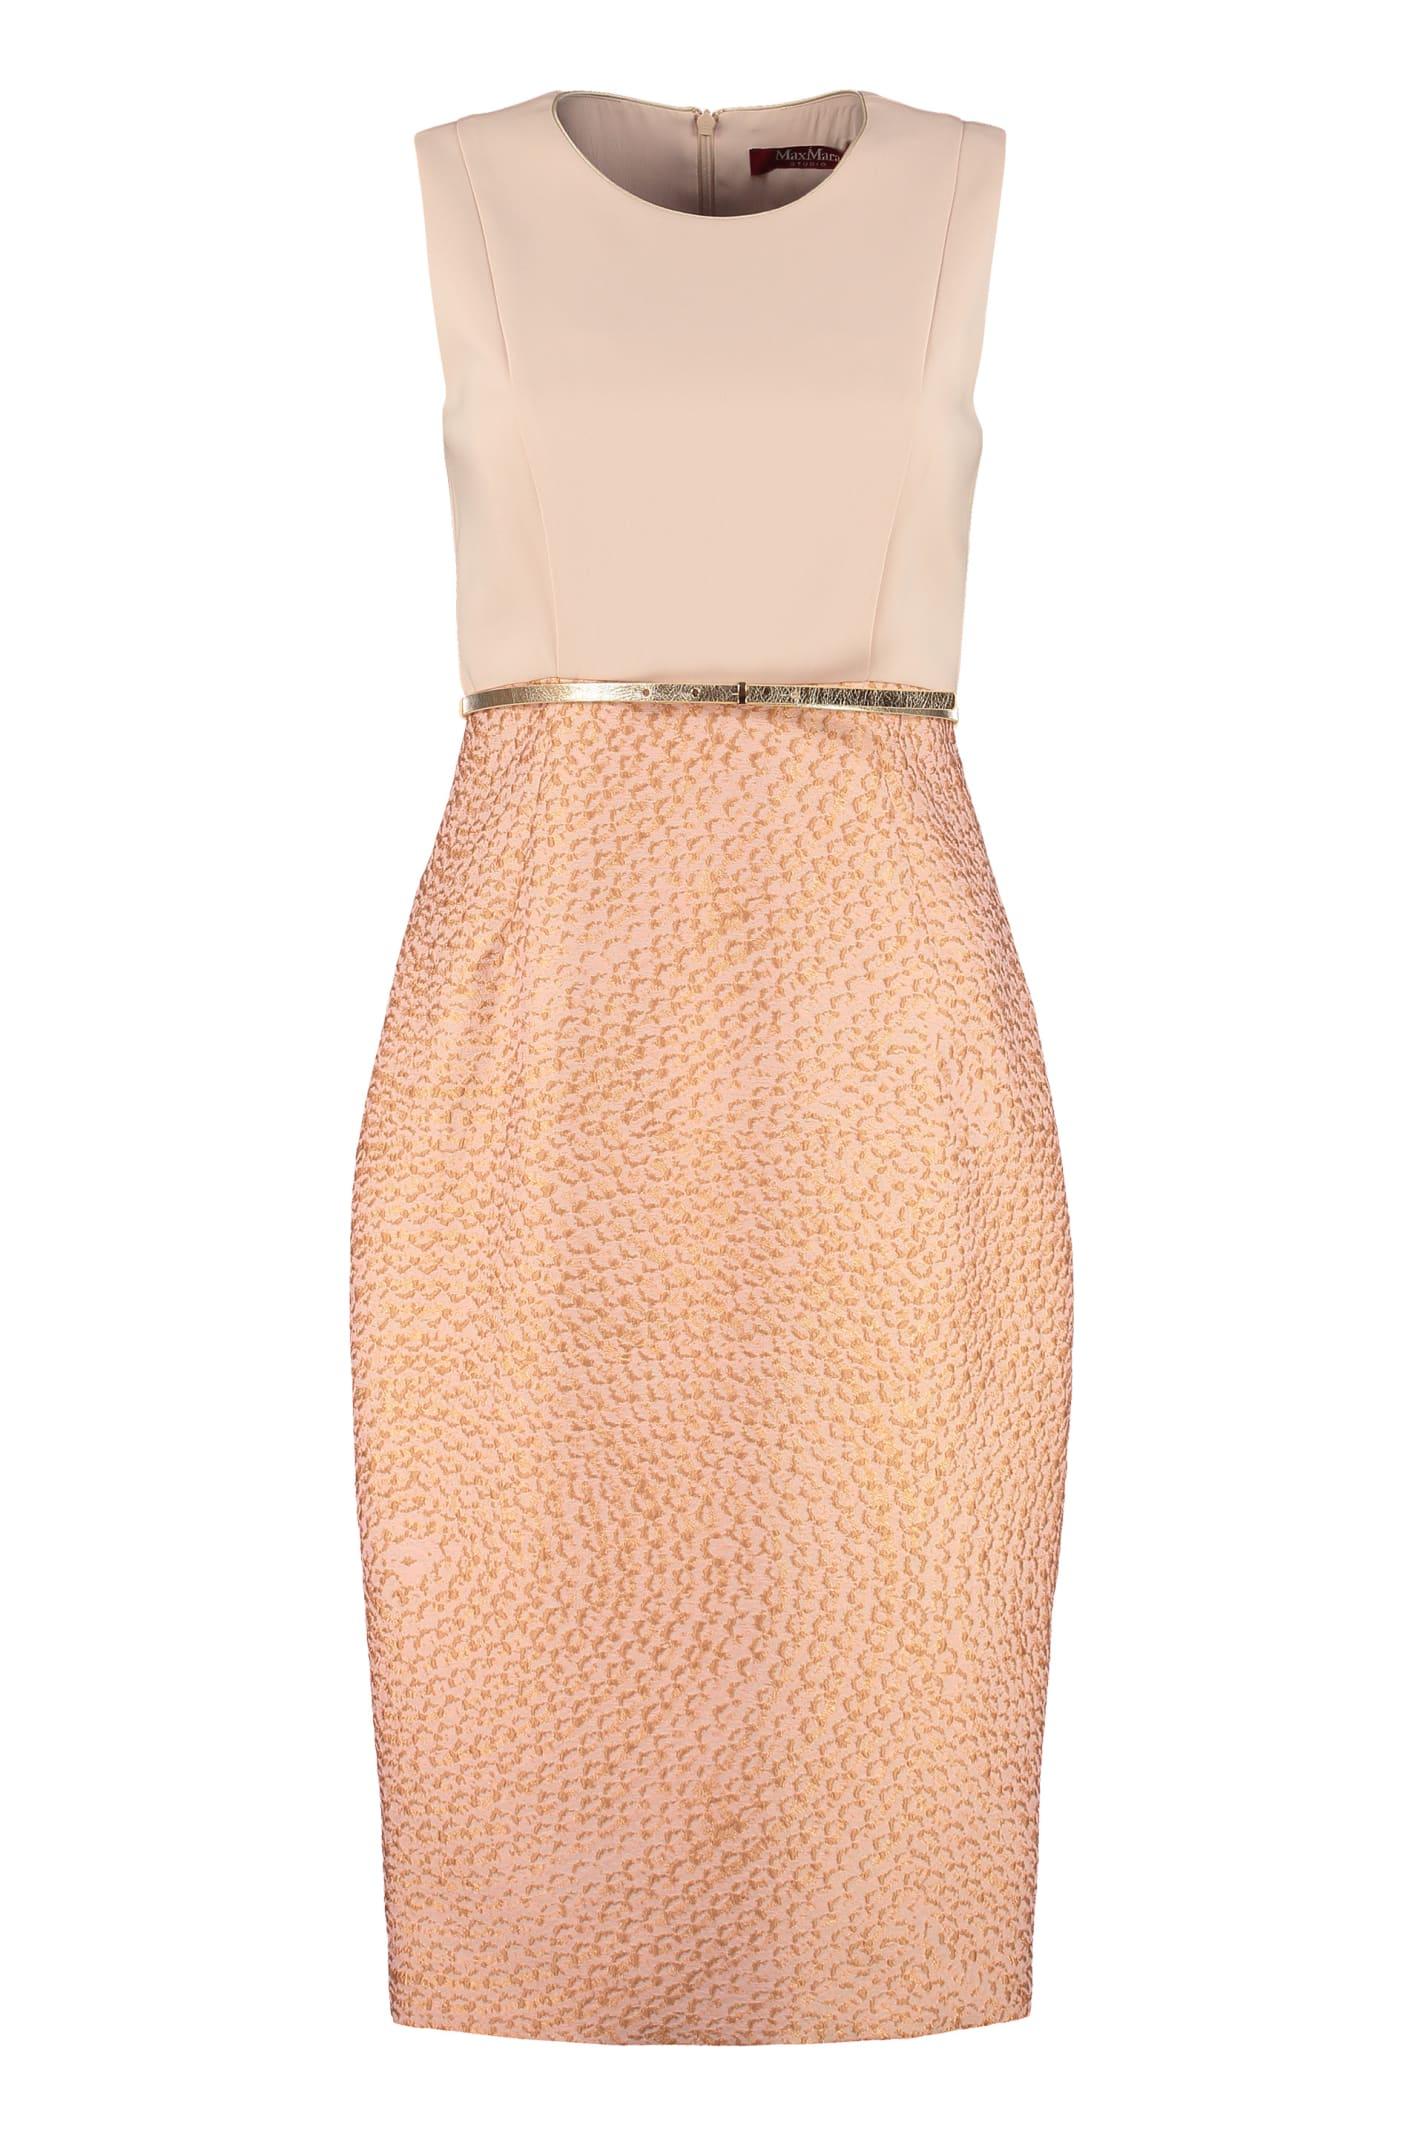 Buy Max Mara Studio Aguzze Sheath Dress online, shop Max Mara Studio with free shipping